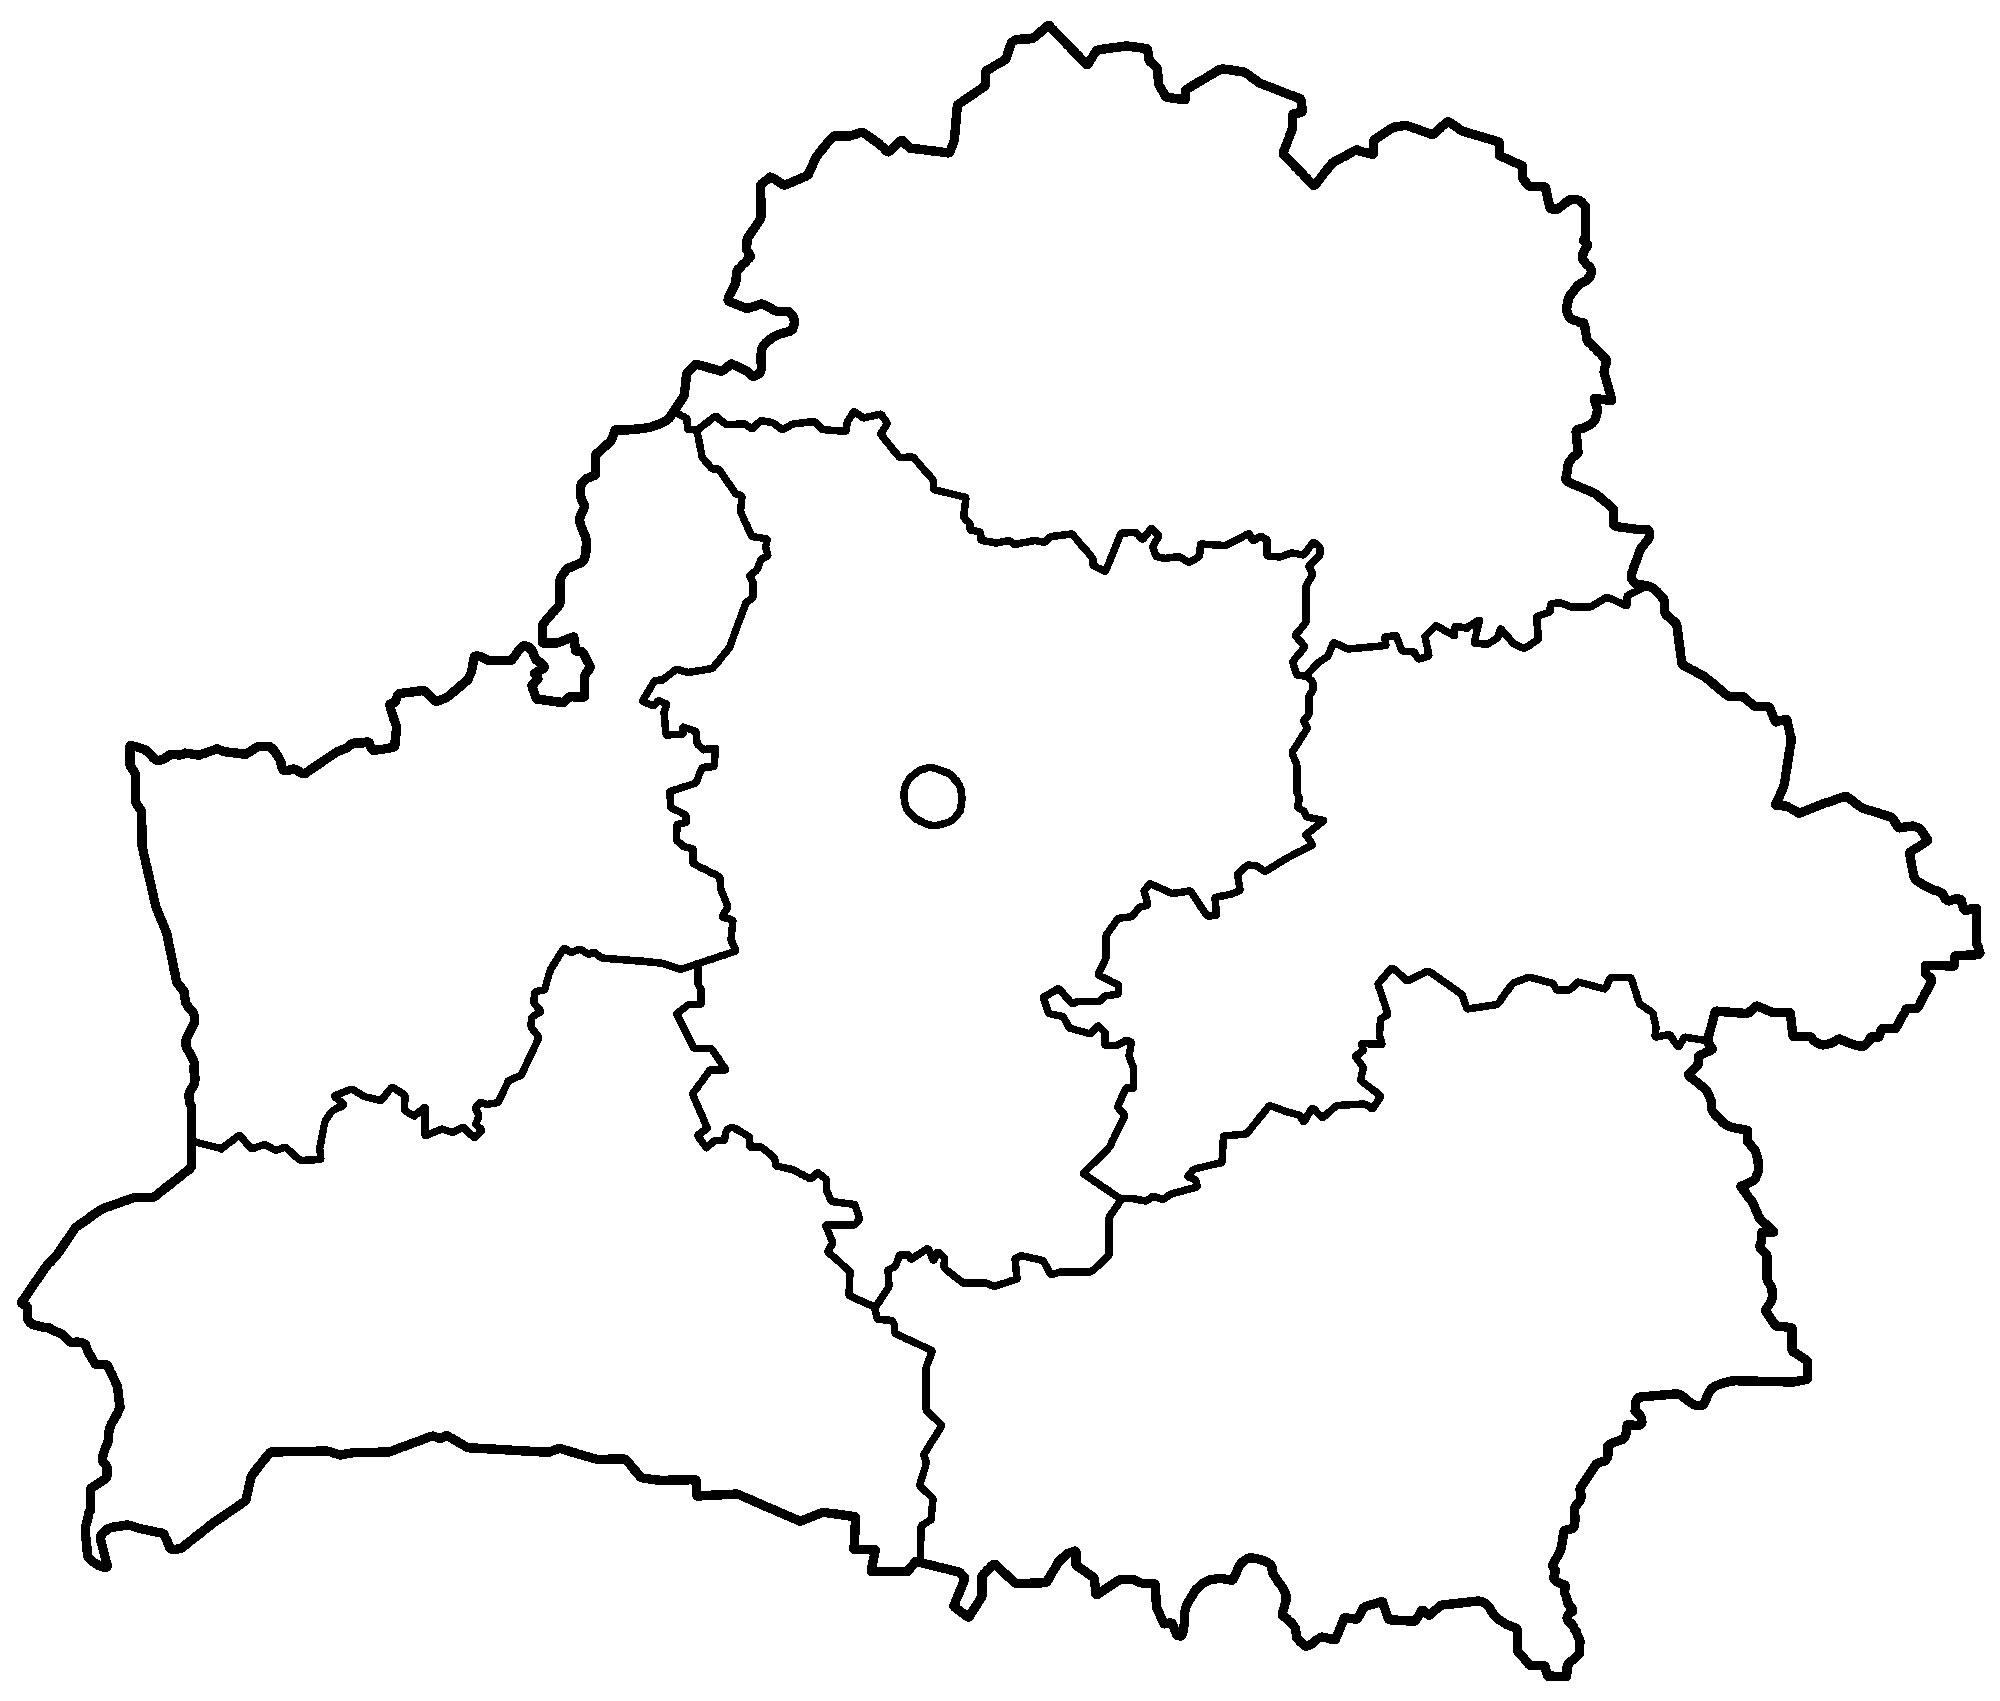 Carte Biélorussie Vierge, Carte Vierge De Biélorussie tout Carte Vierge De France